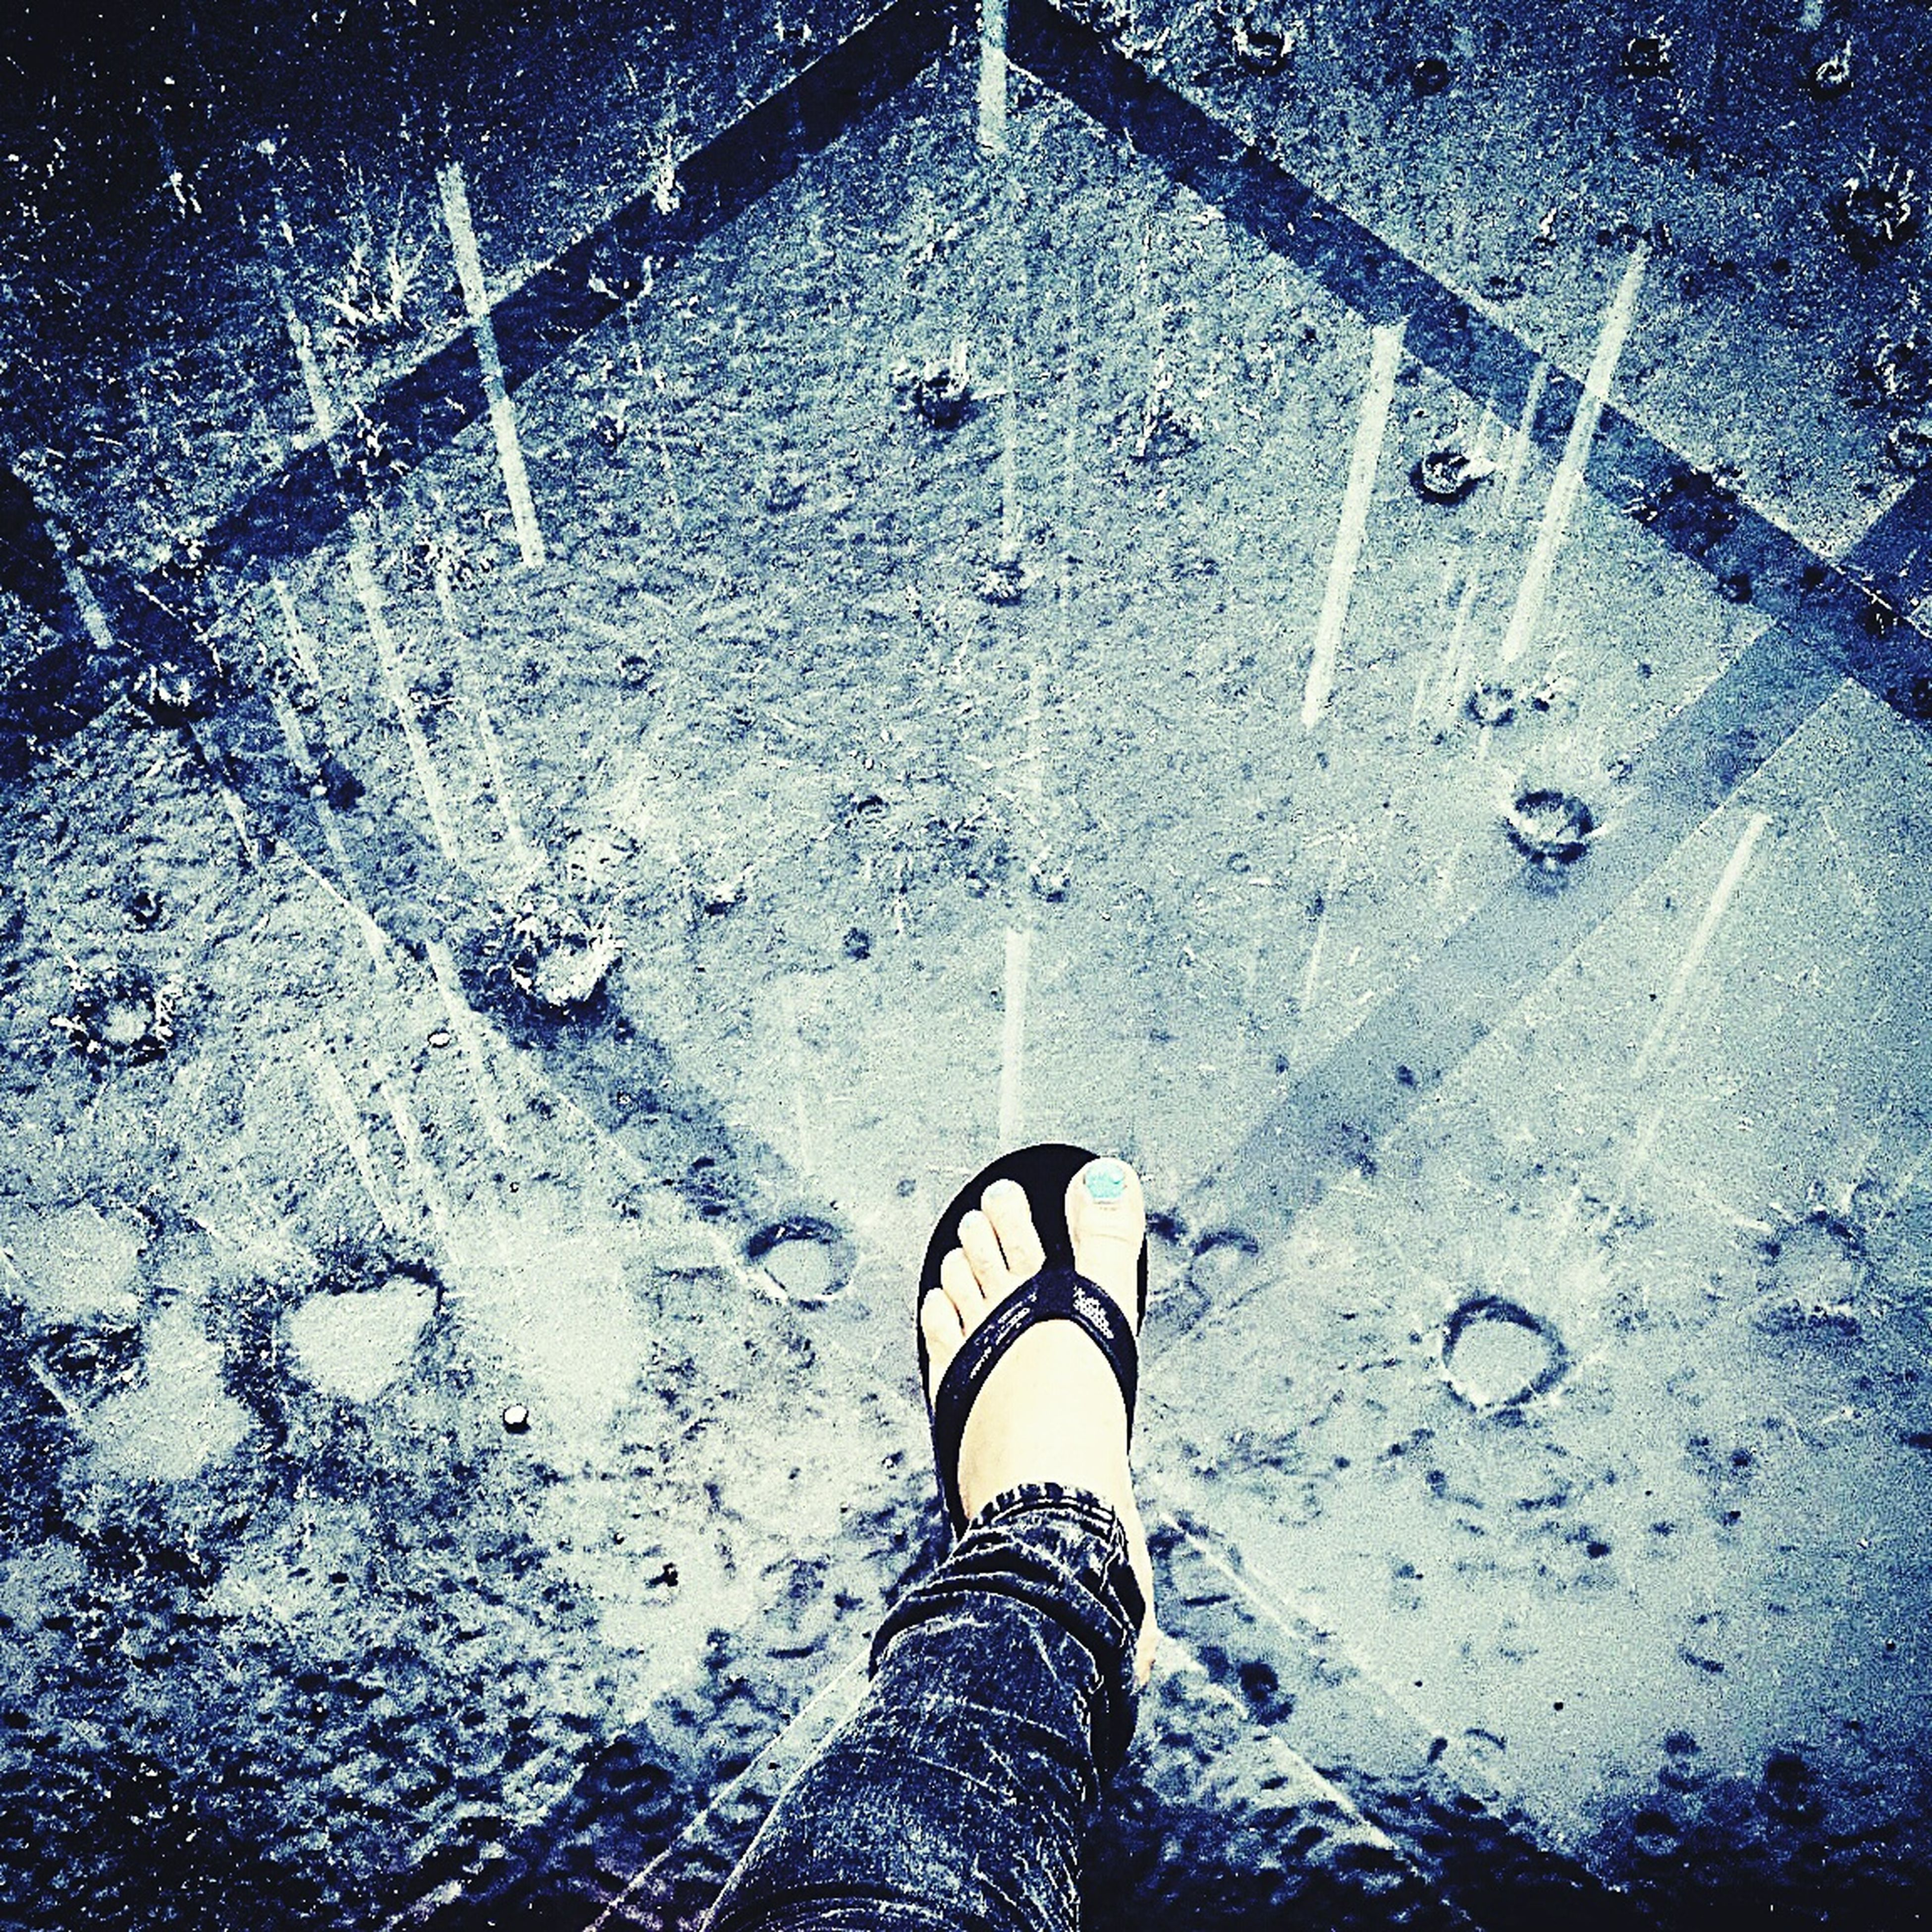 low section, person, street, high angle view, wet, puddle, standing, shoe, rain, personal perspective, lifestyles, road, men, season, unrecognizable person, transportation, asphalt